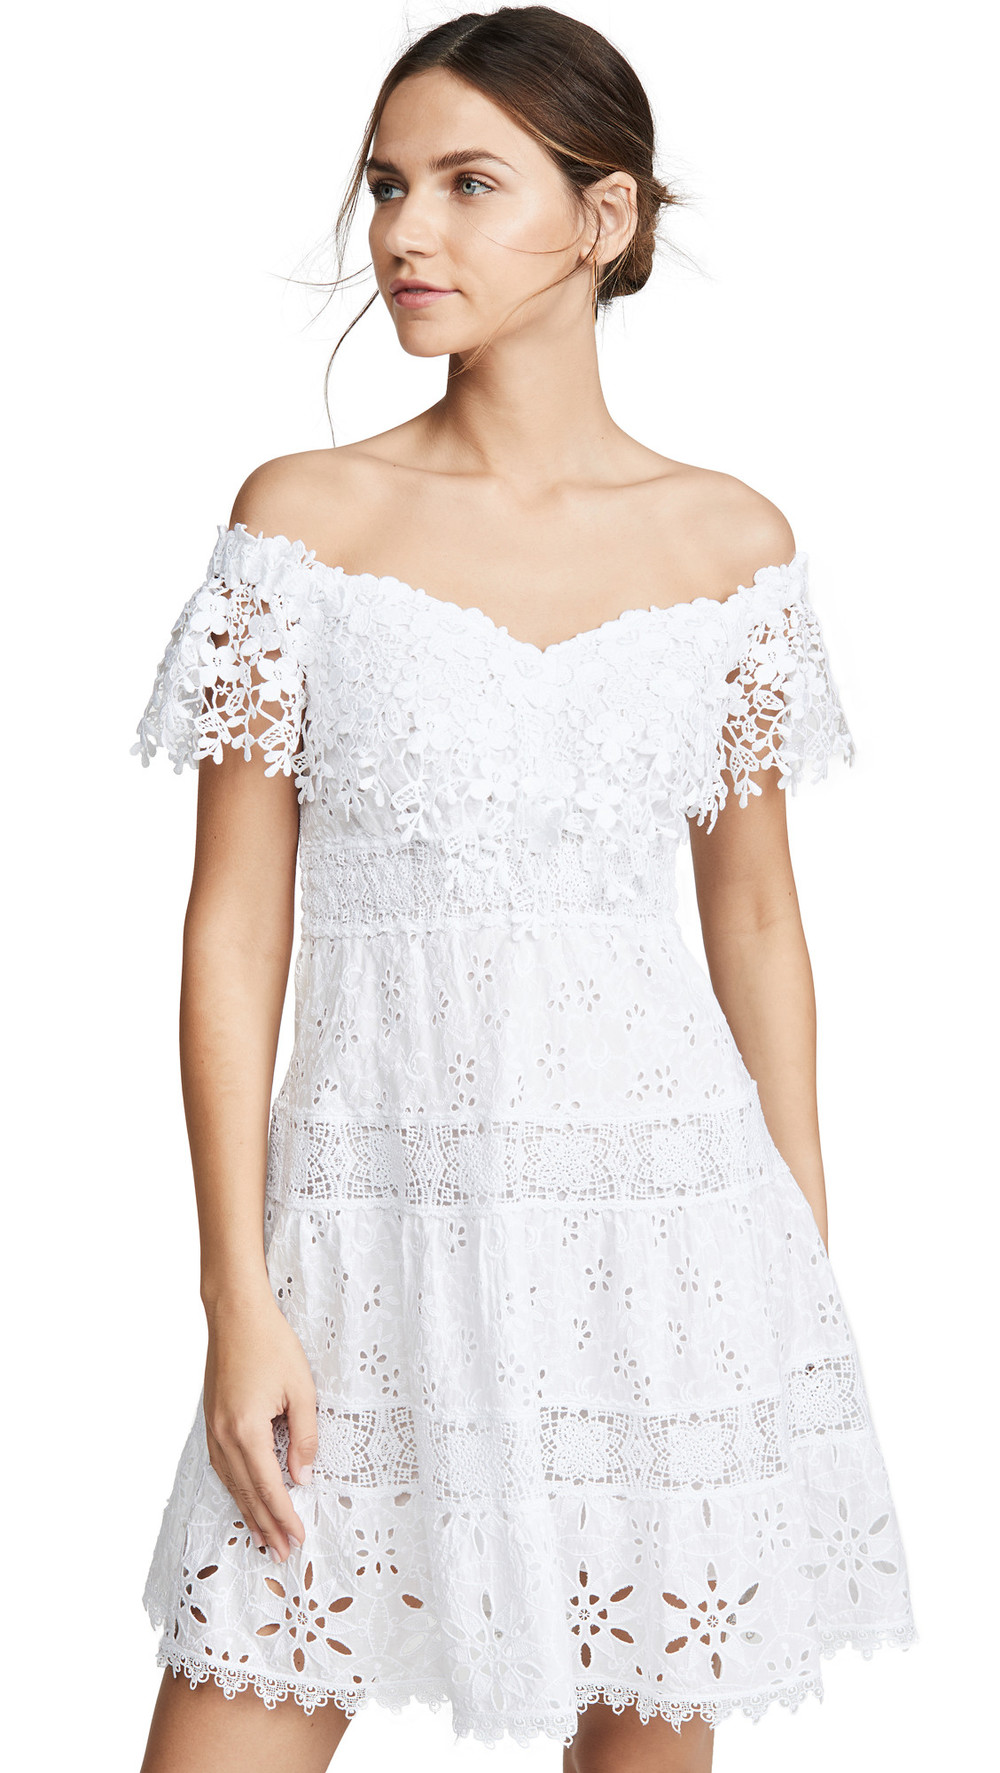 Temptation Positano Sondrio Corto Dress in white